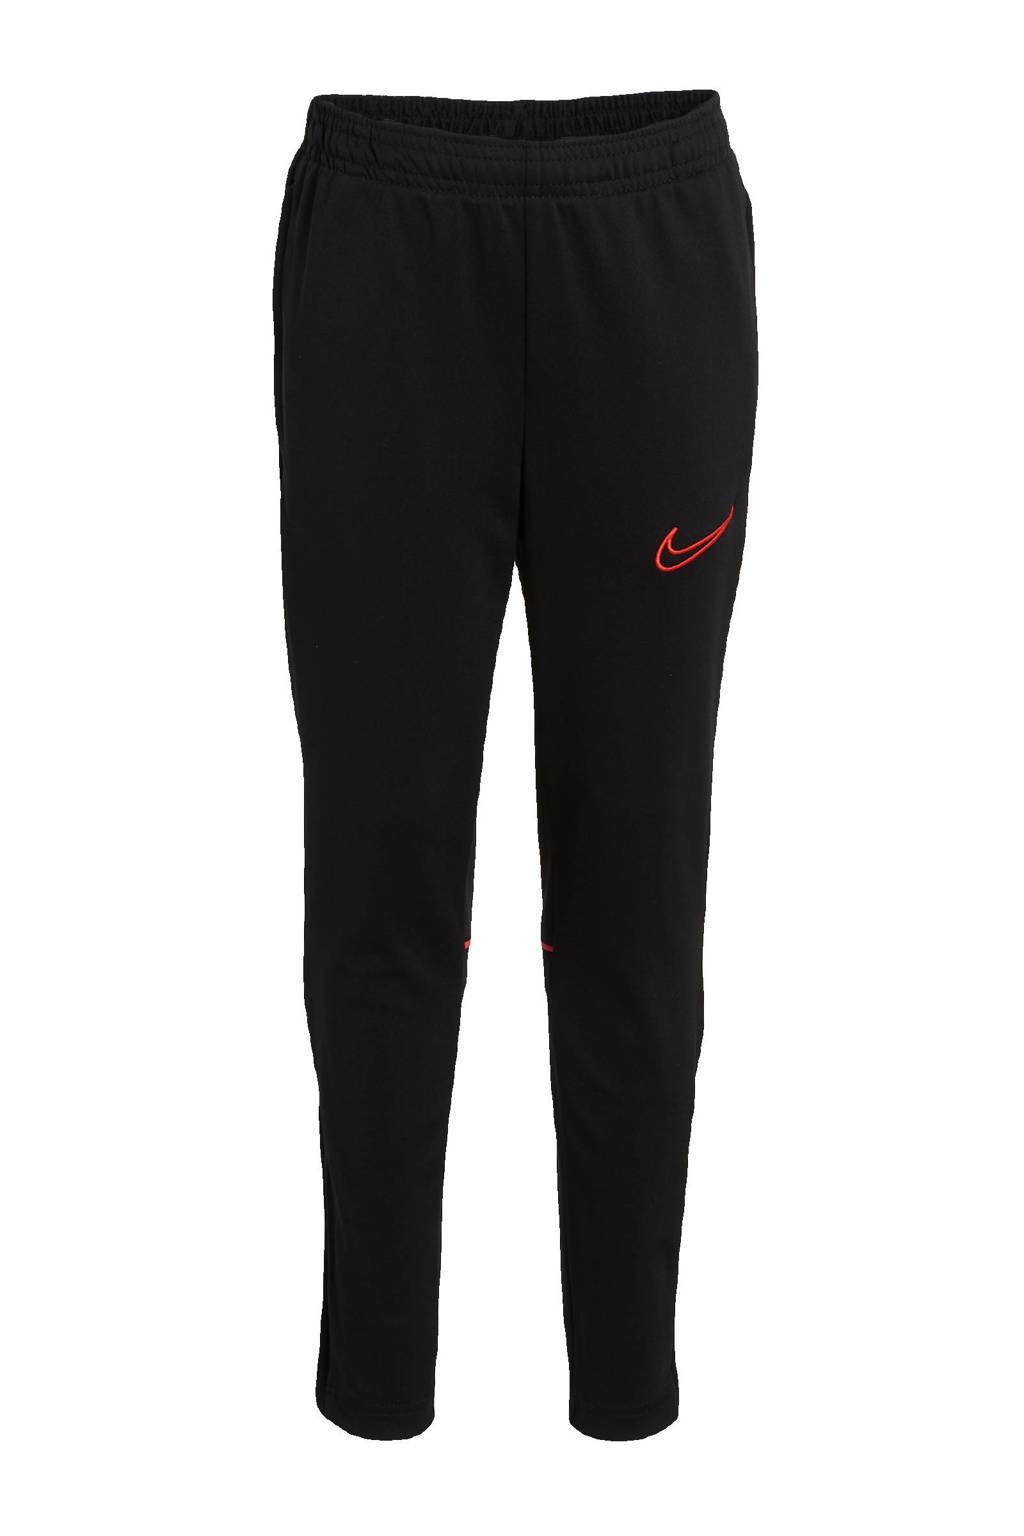 Nike Junior  trainingsbroek zwart/rood, Zwart/rood